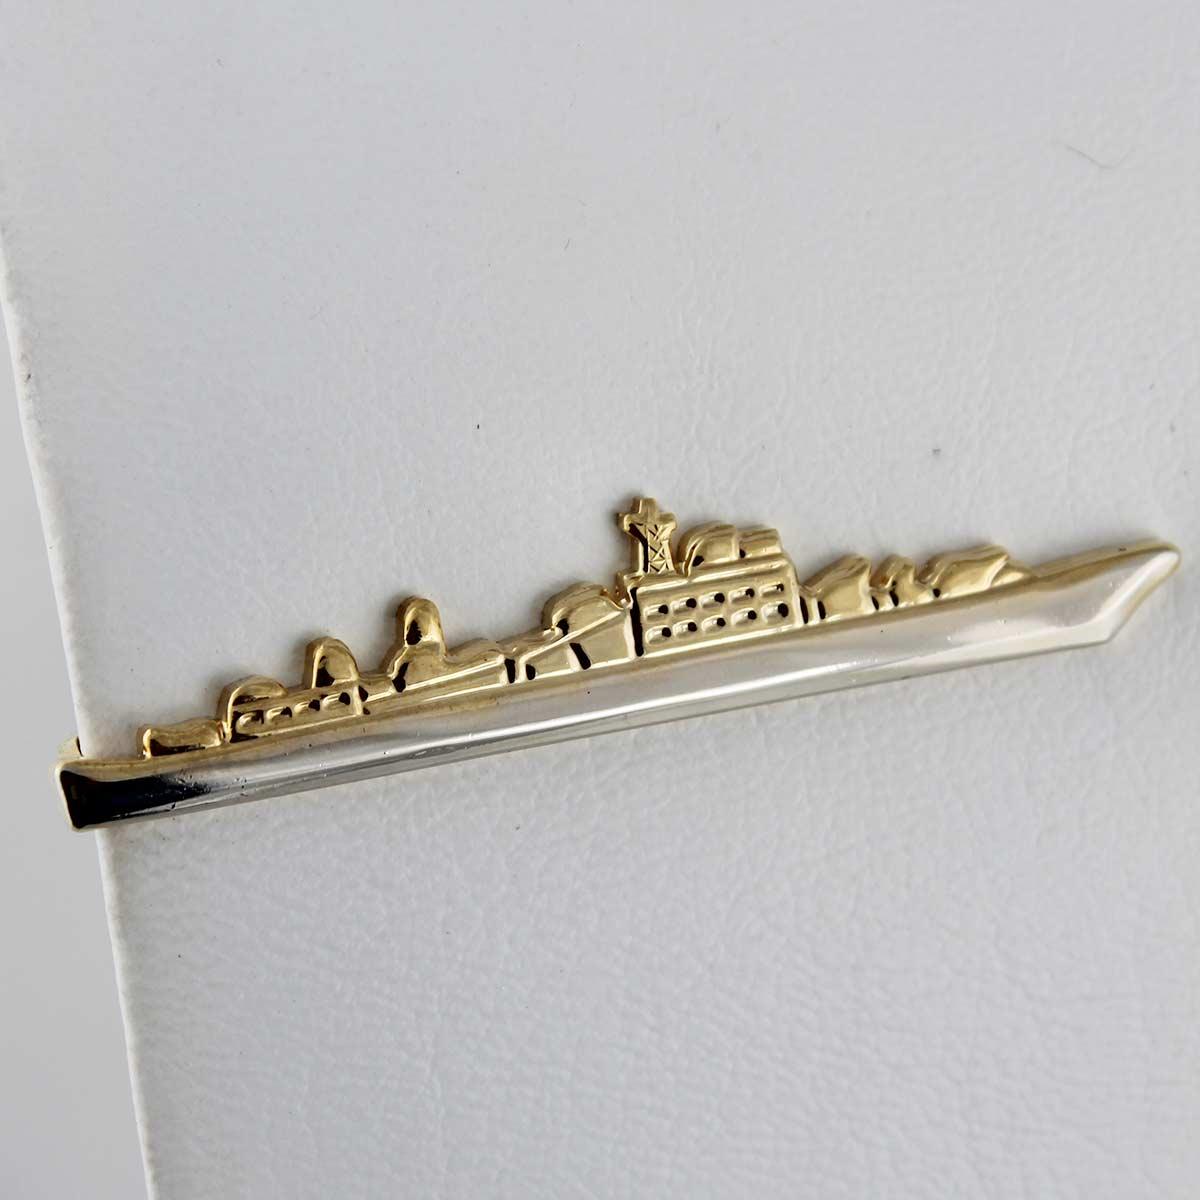 Prendedor de Gravata Formato Navio - Prateado e Dourado